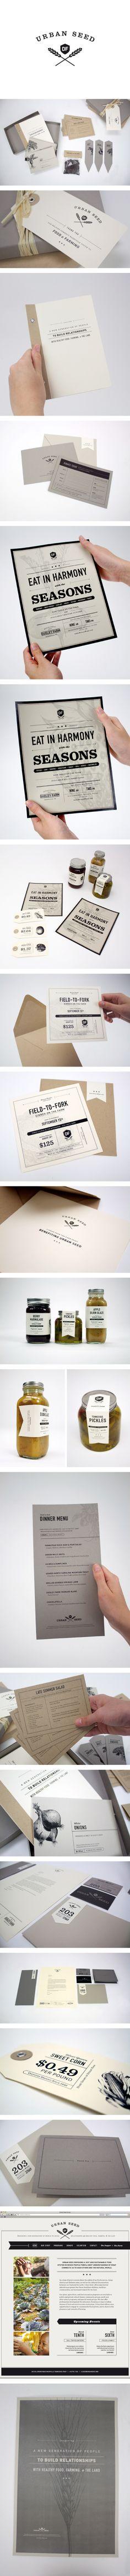 Urband Seed 品牌設計 | MyDesy 淘靈感